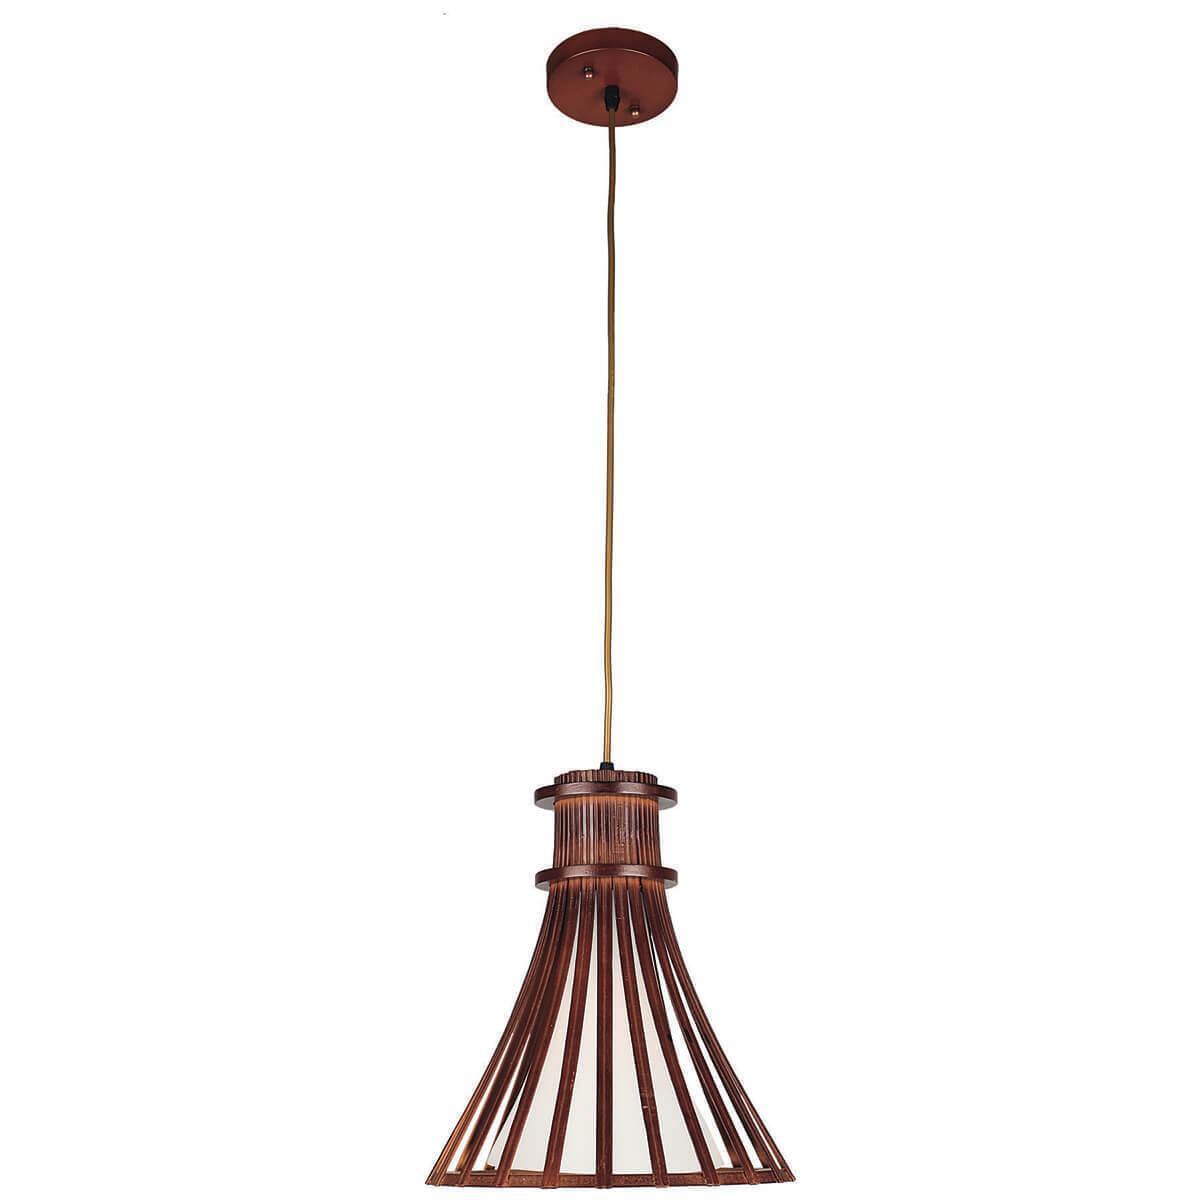 Подвесной светильник Omnilux OML-59413-01, E27, 40 Вт